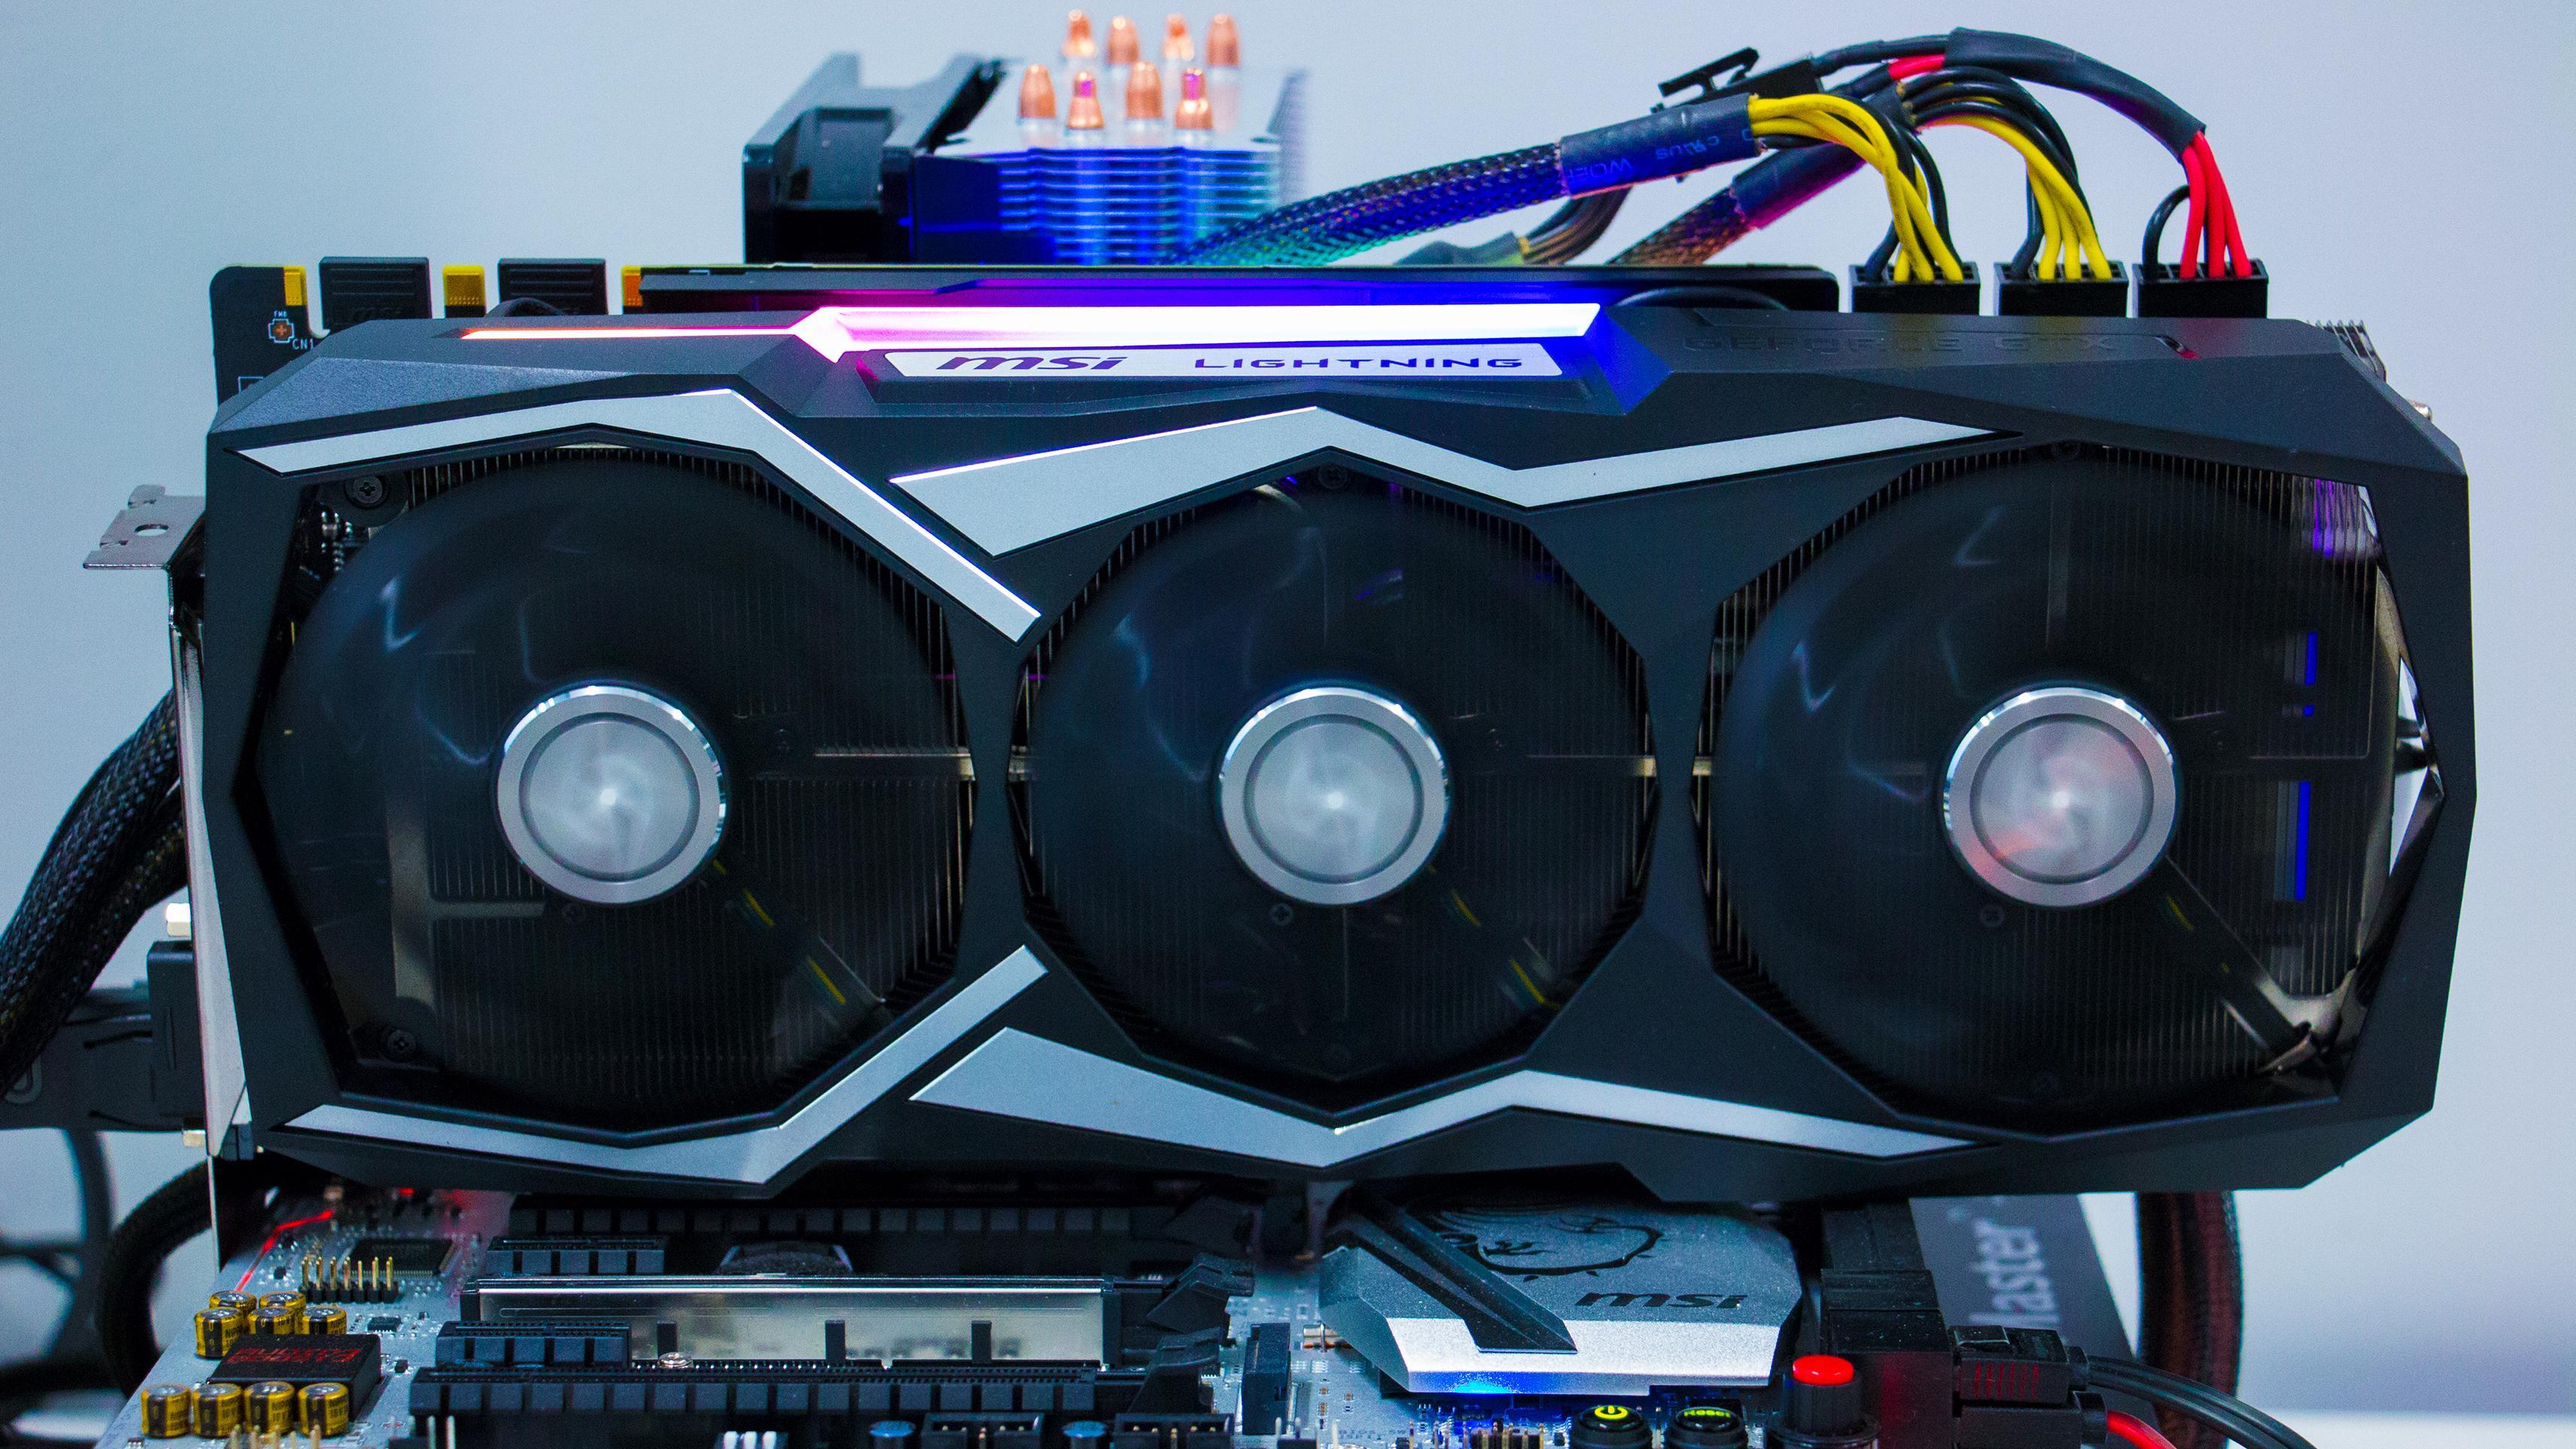 GTX 1080 Ti Lightning Z møter GTX 1080 Ti Gaming X